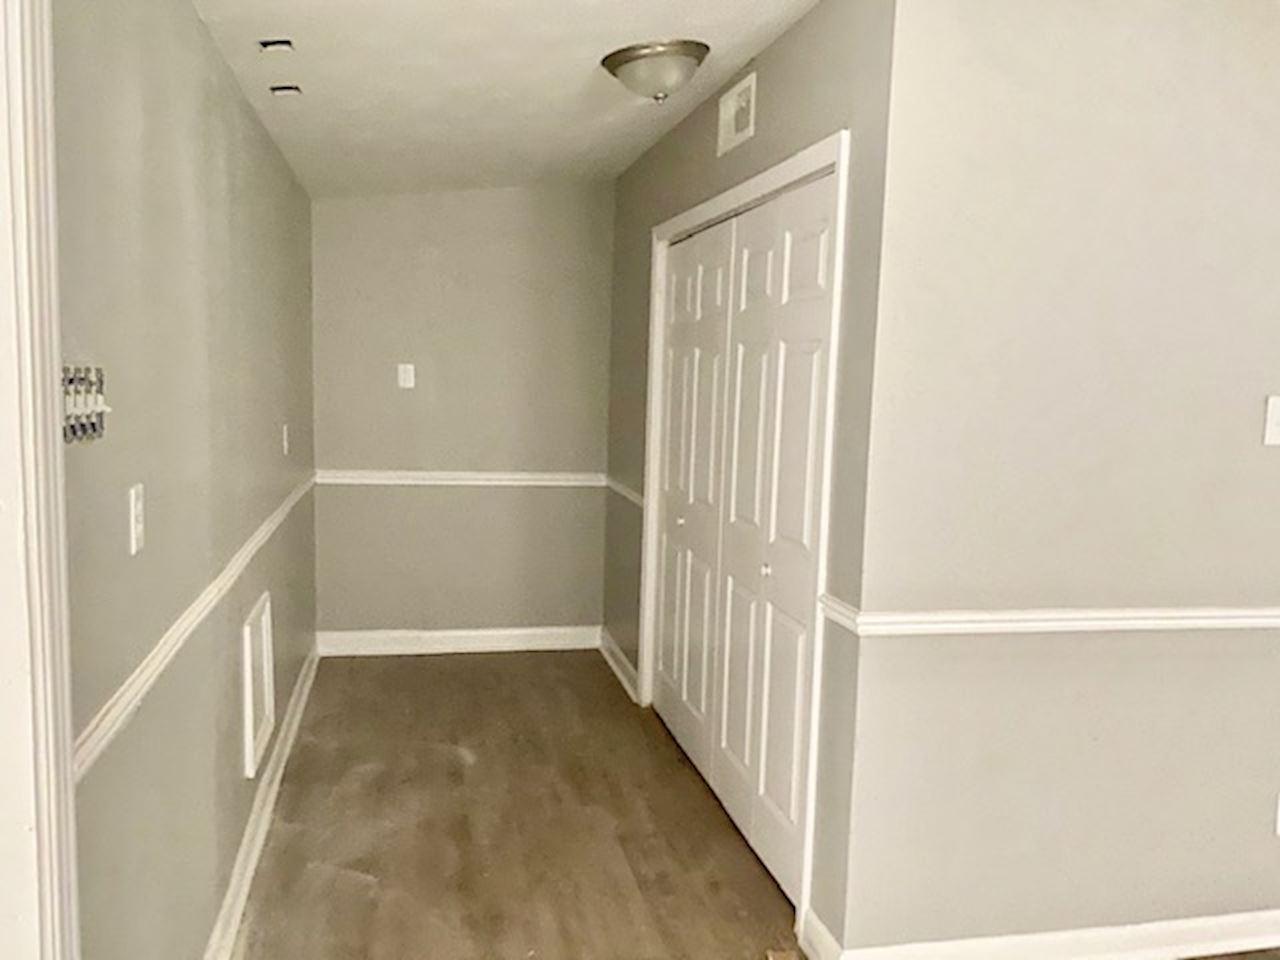 investment property - 2714 Nix Cv, Memphis, TN 38127, Shelby - image 6